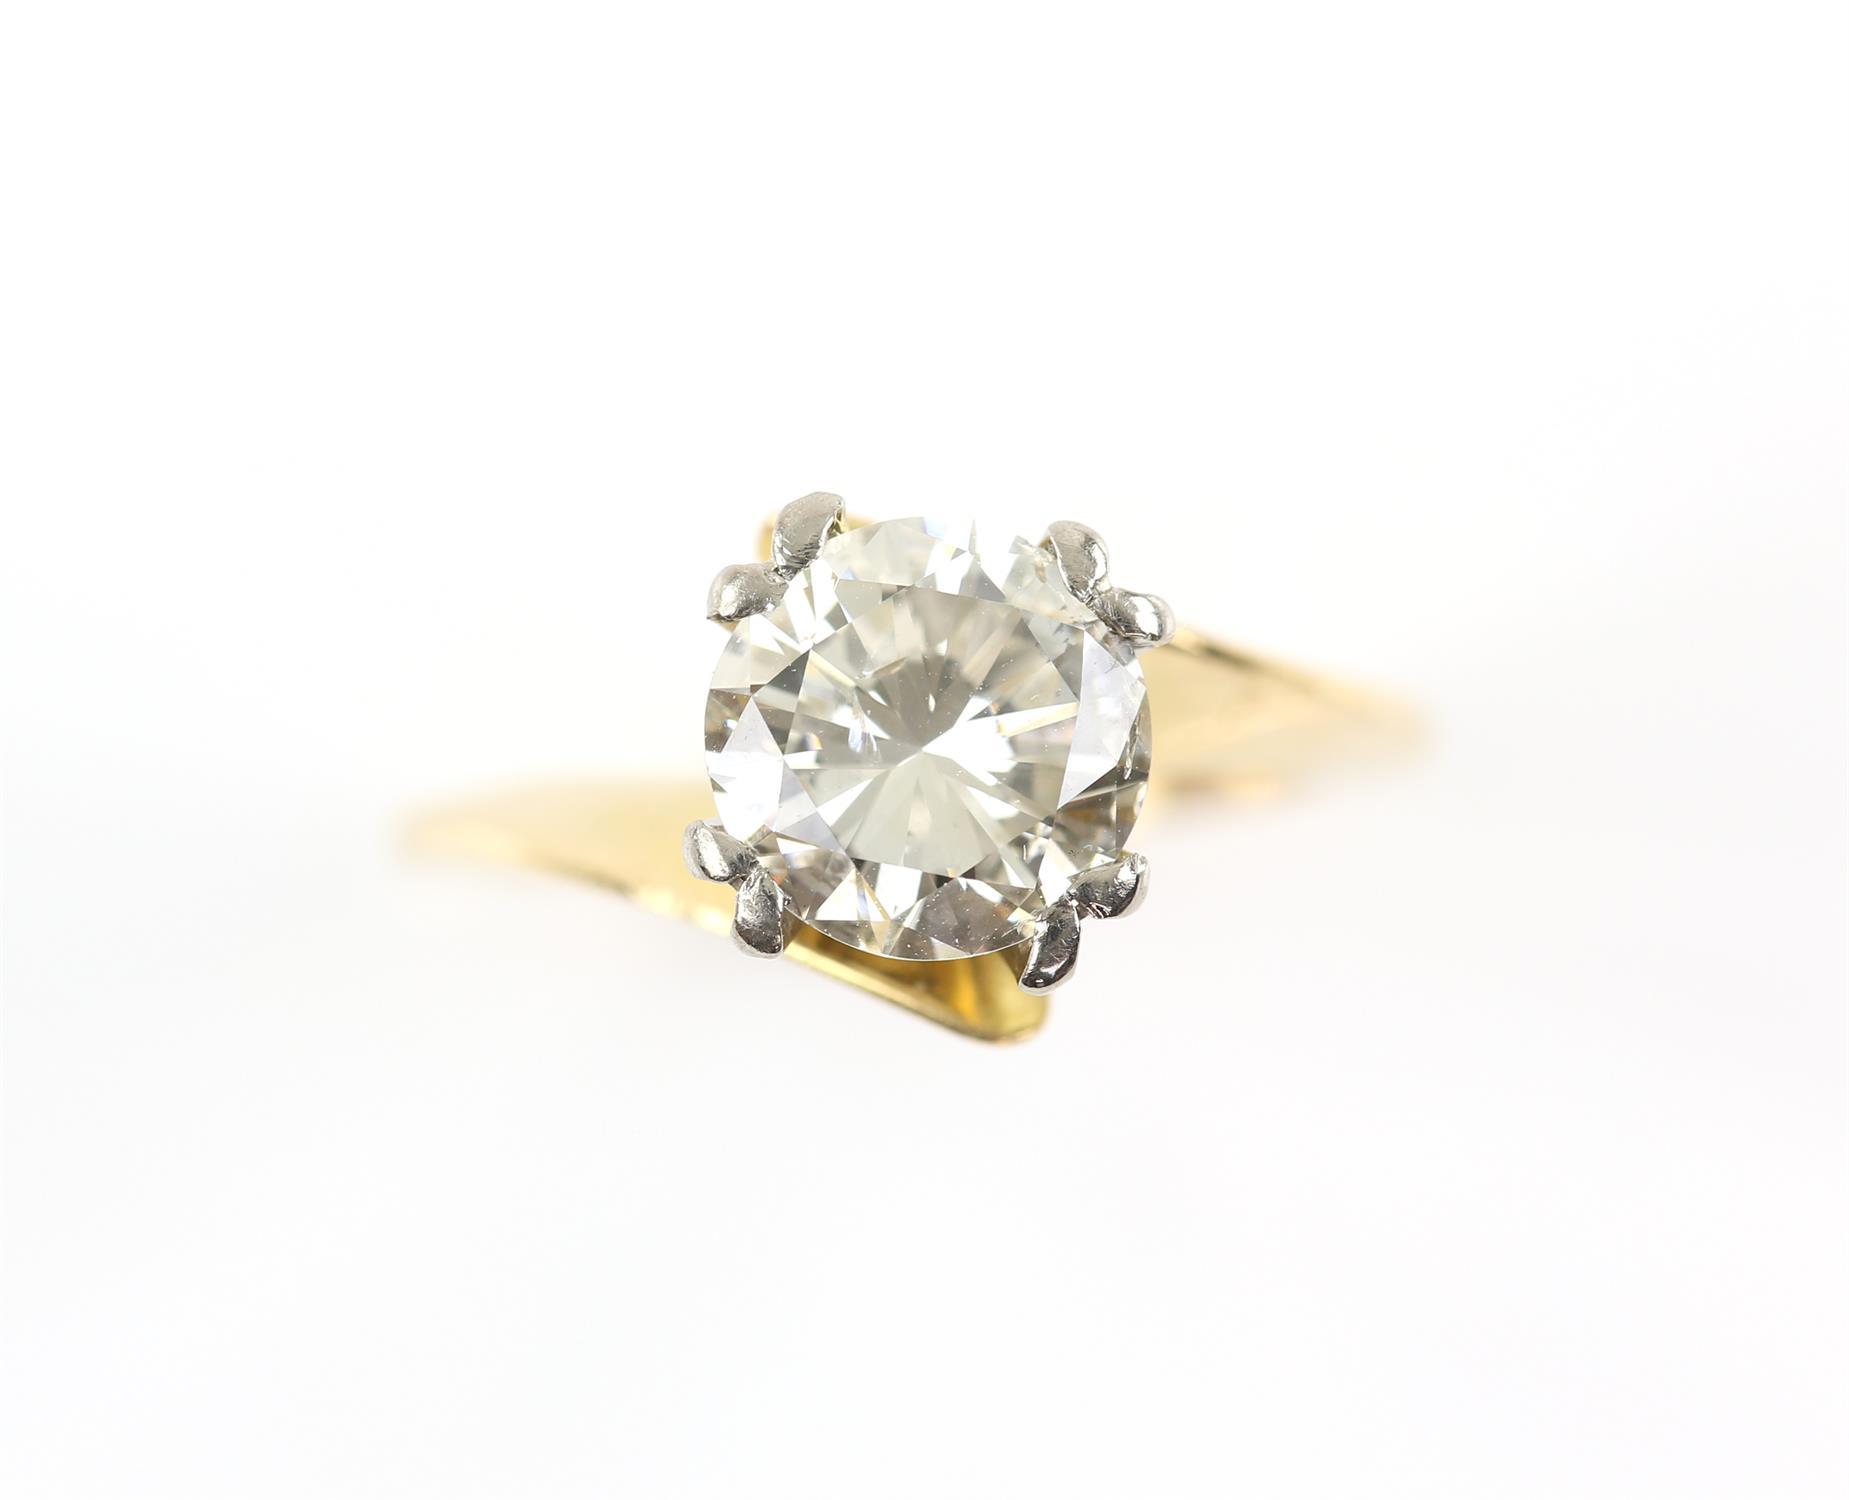 Single stone diamond ring, round brilliant cut diamond weighing an estimated 2.02 carats,